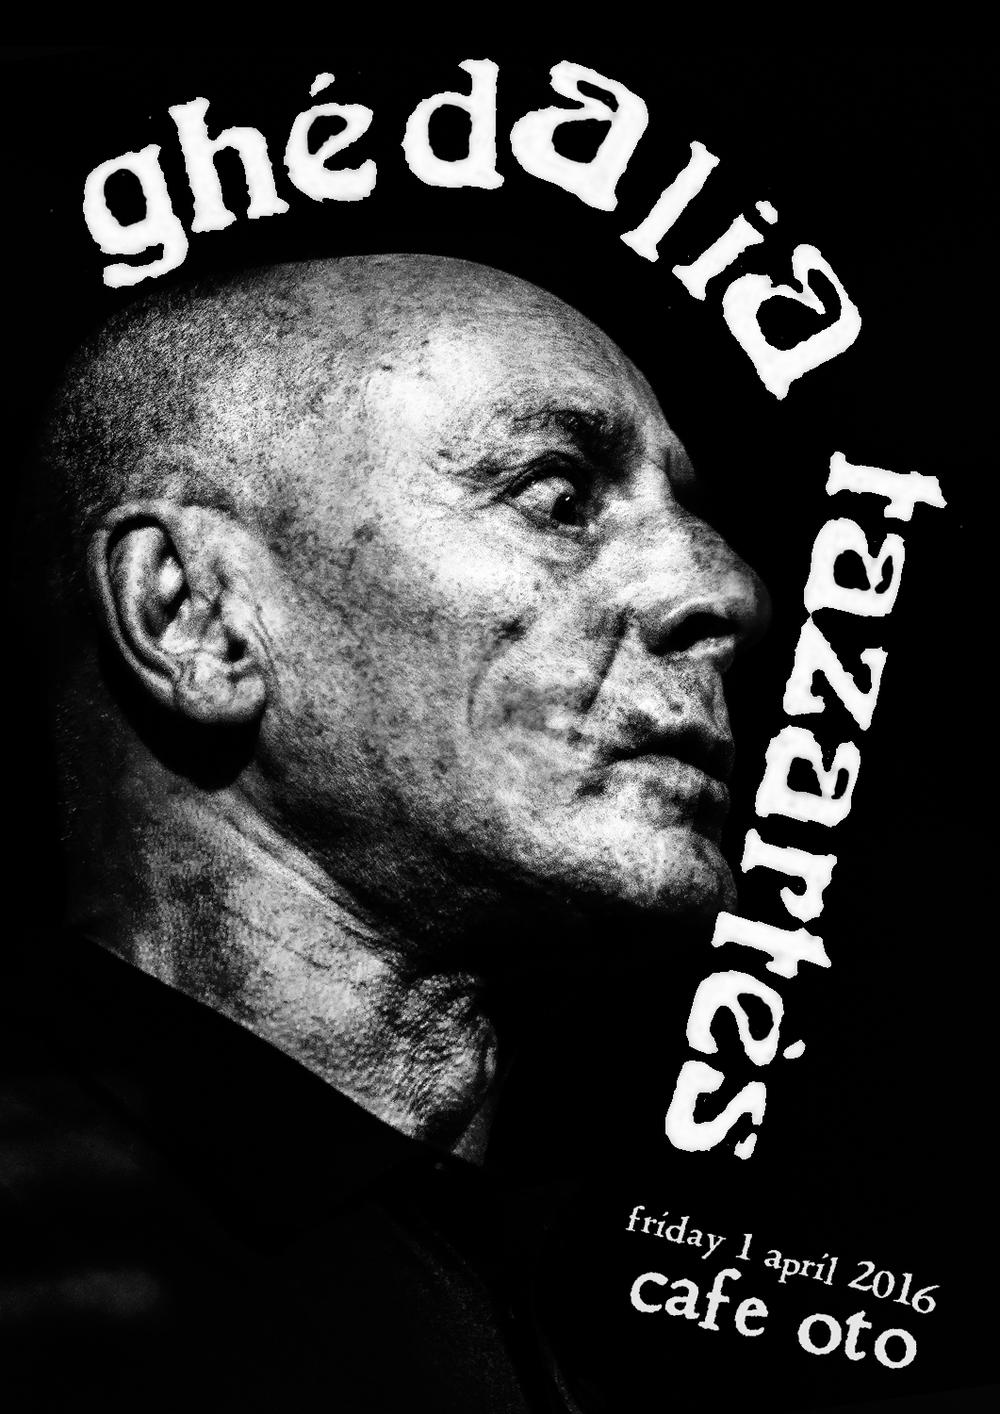 Poster design for Ghédalia Tazartès at Cafe OTO. Photos sourced from Dawid Laskowski.